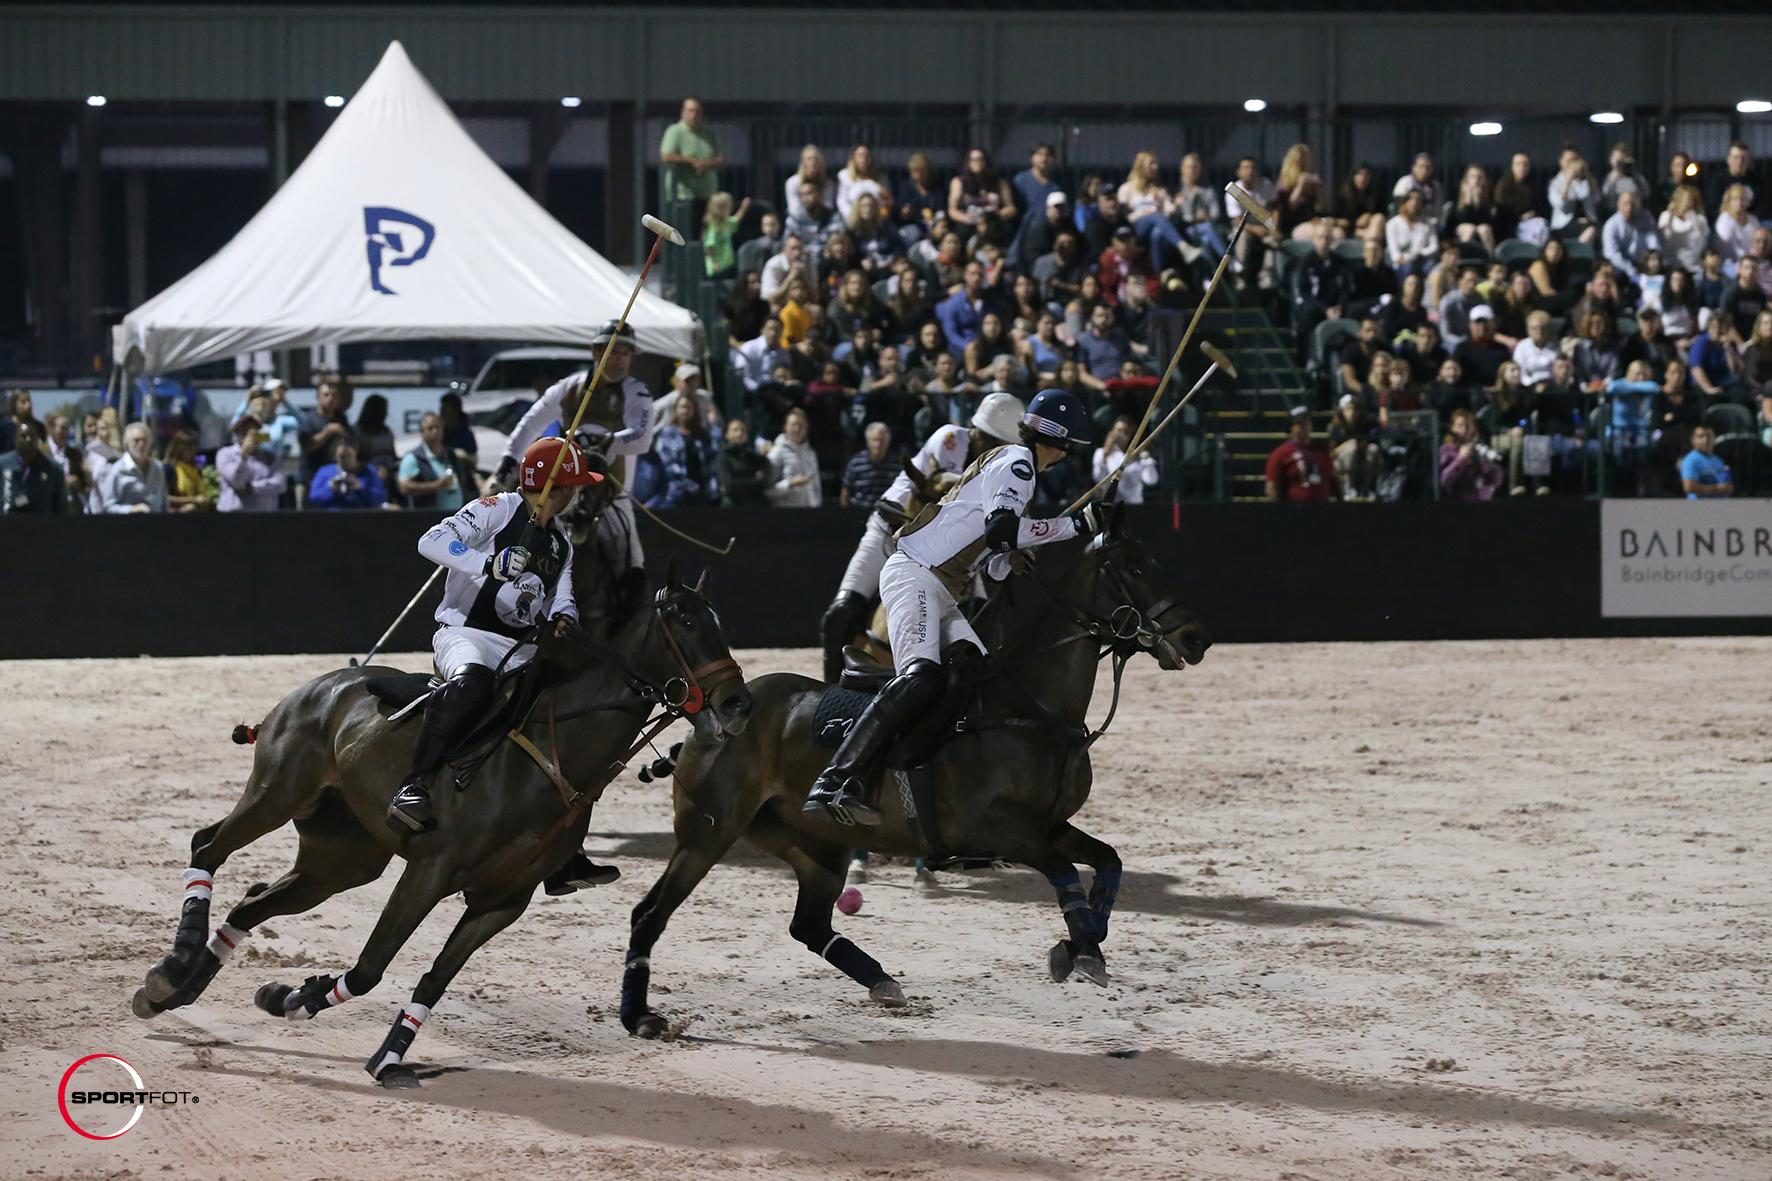 Santi Torres and Felipe Viana - Sportfot